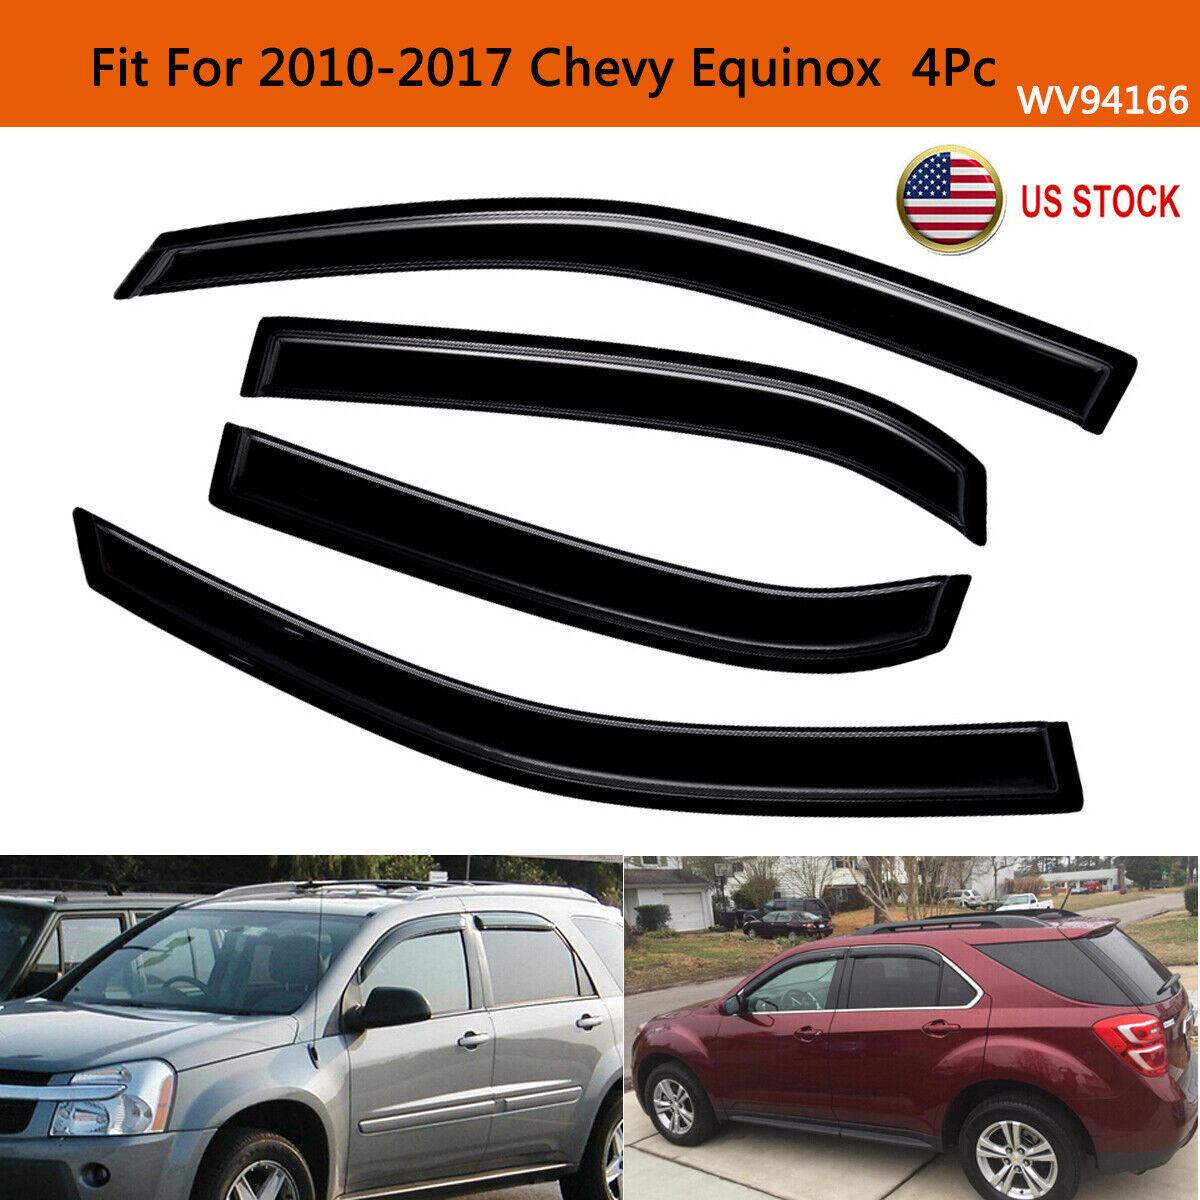 Tape-On Rain Guard Window Visor Dark Grey 4pcs For 2010-2017 Chevrolet Equinox